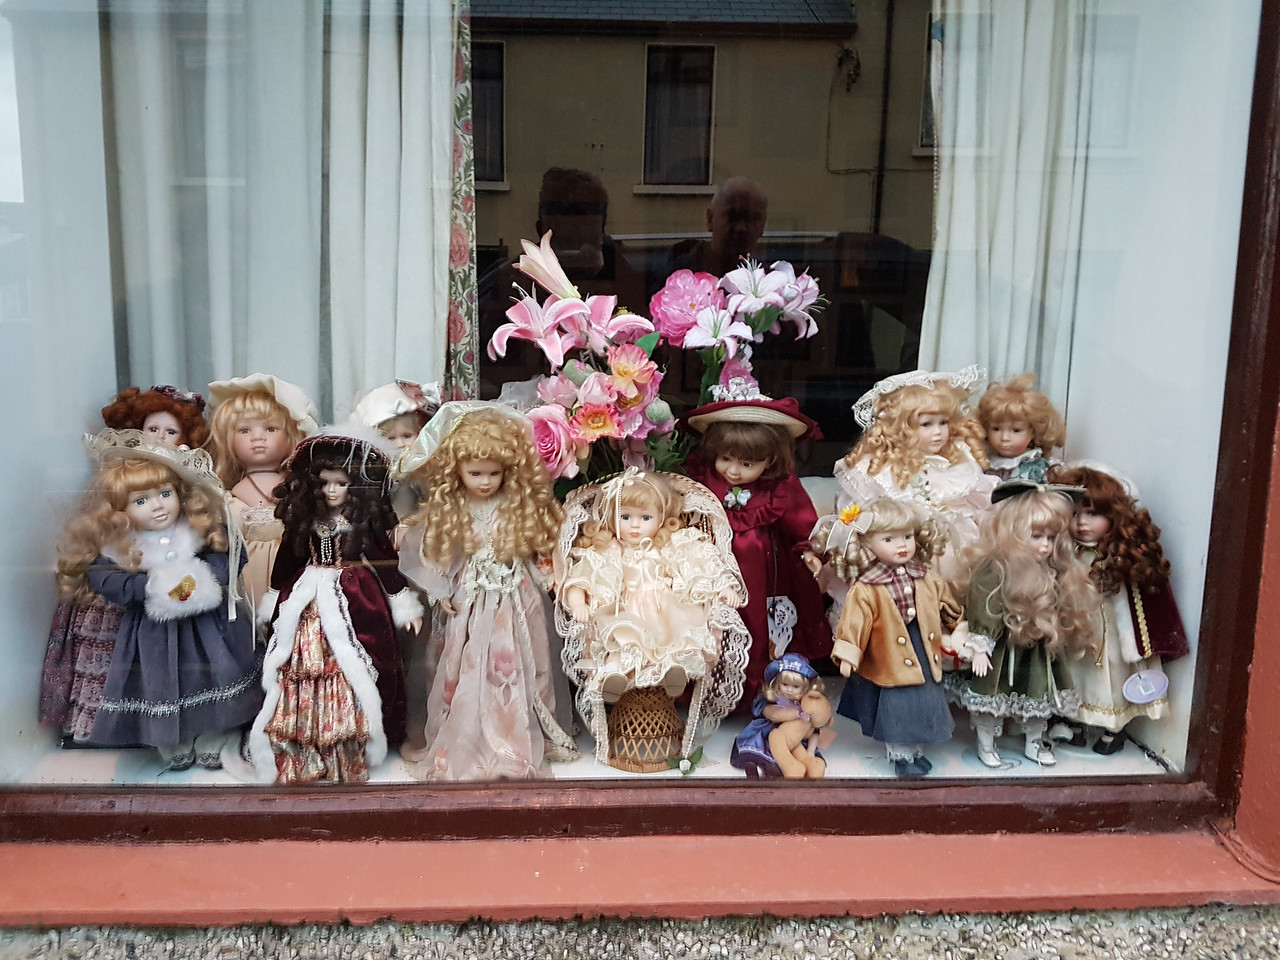 In the window of a B&B in Bundoran. No other word for it - odd.